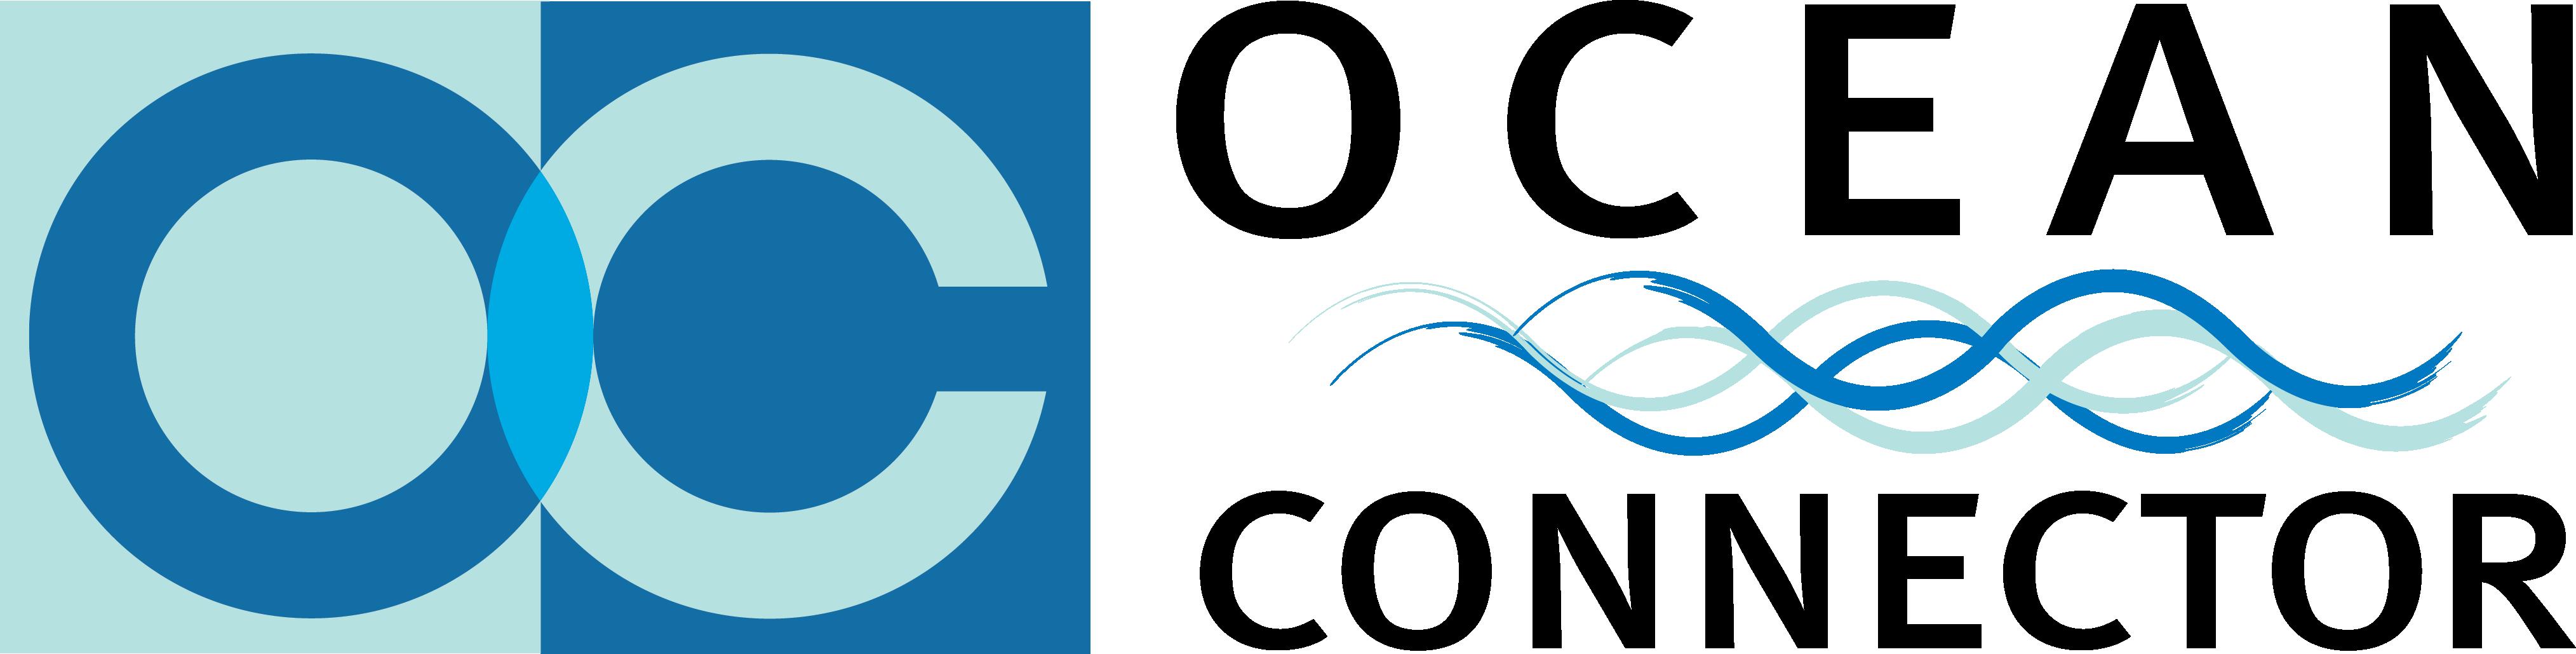 Ocean Connector